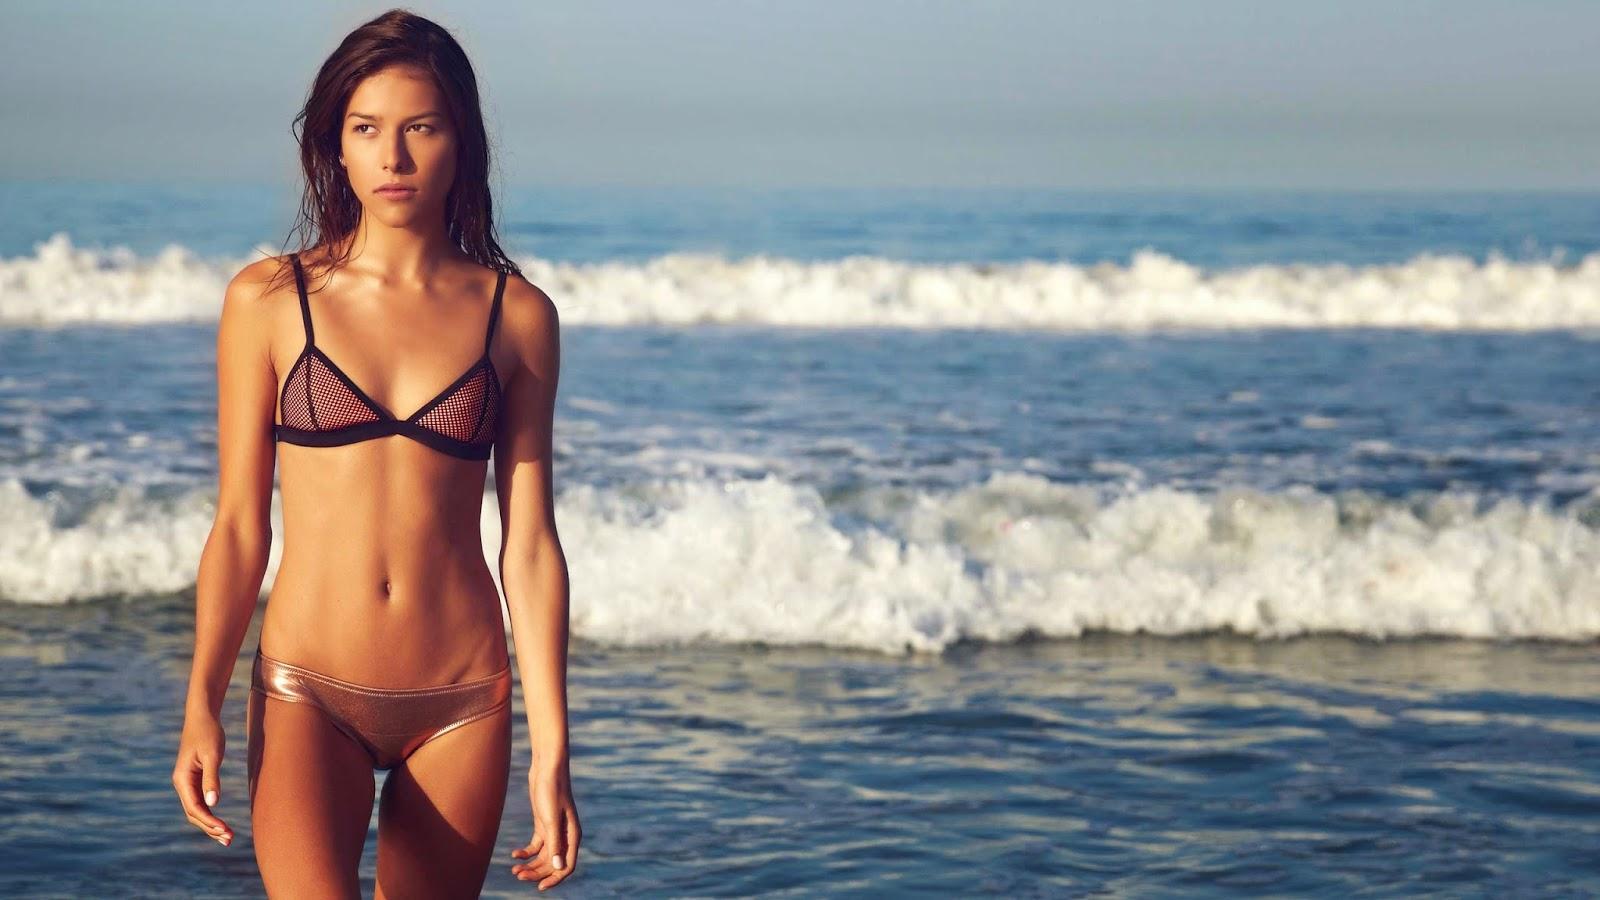 Comfortably chic – the innovative bikini by Triangl